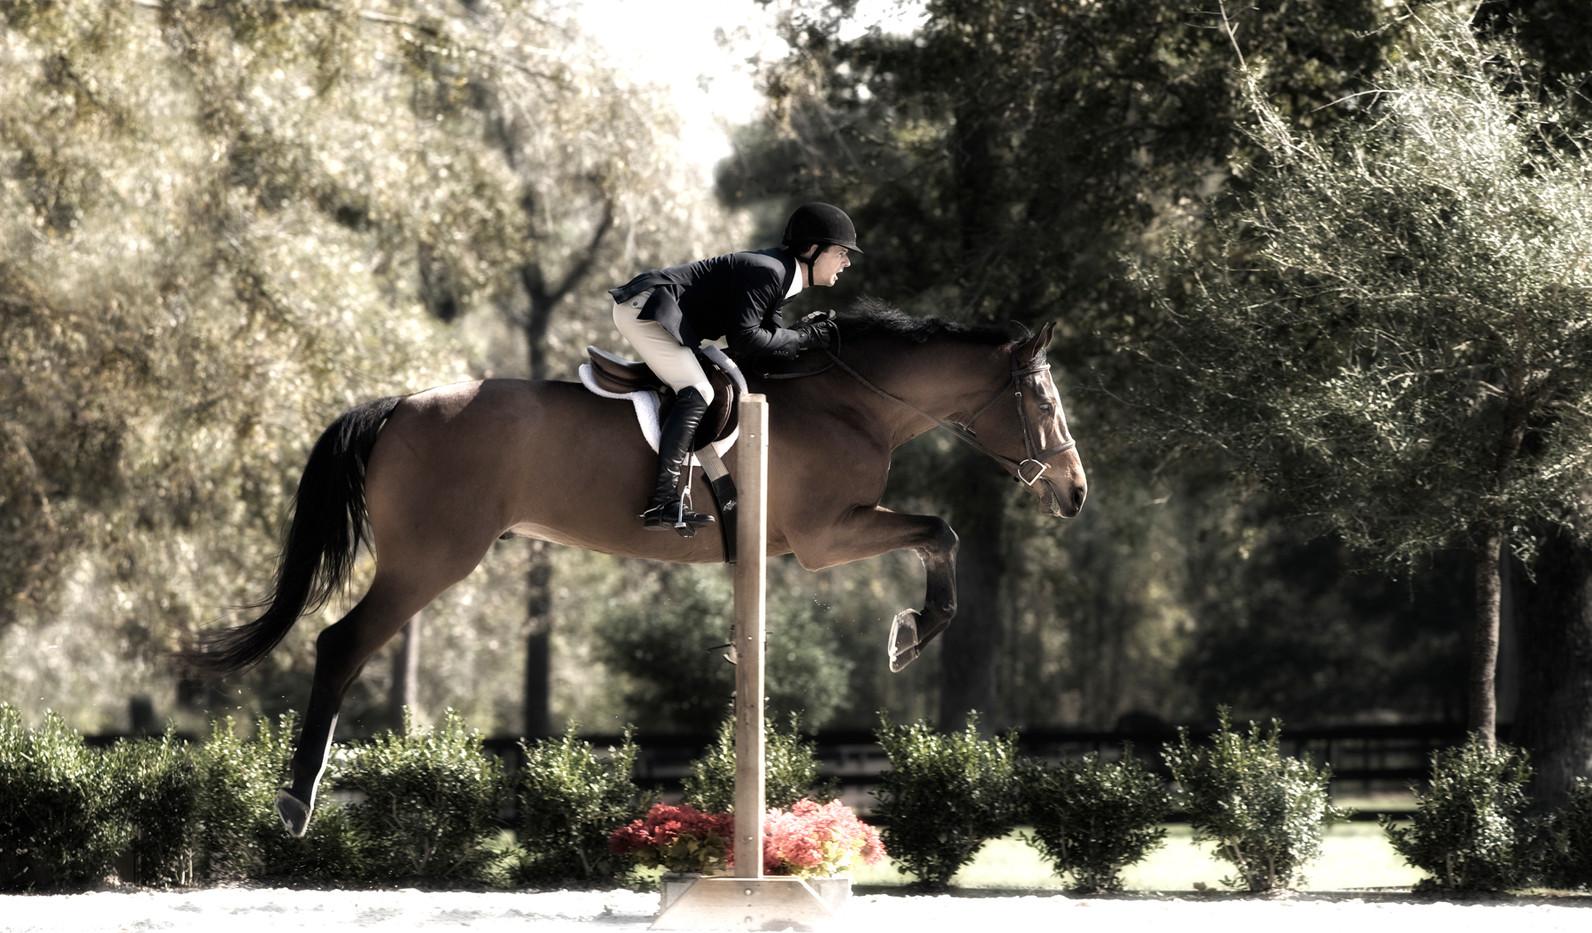 equestrian_houston_photography 4.jpg